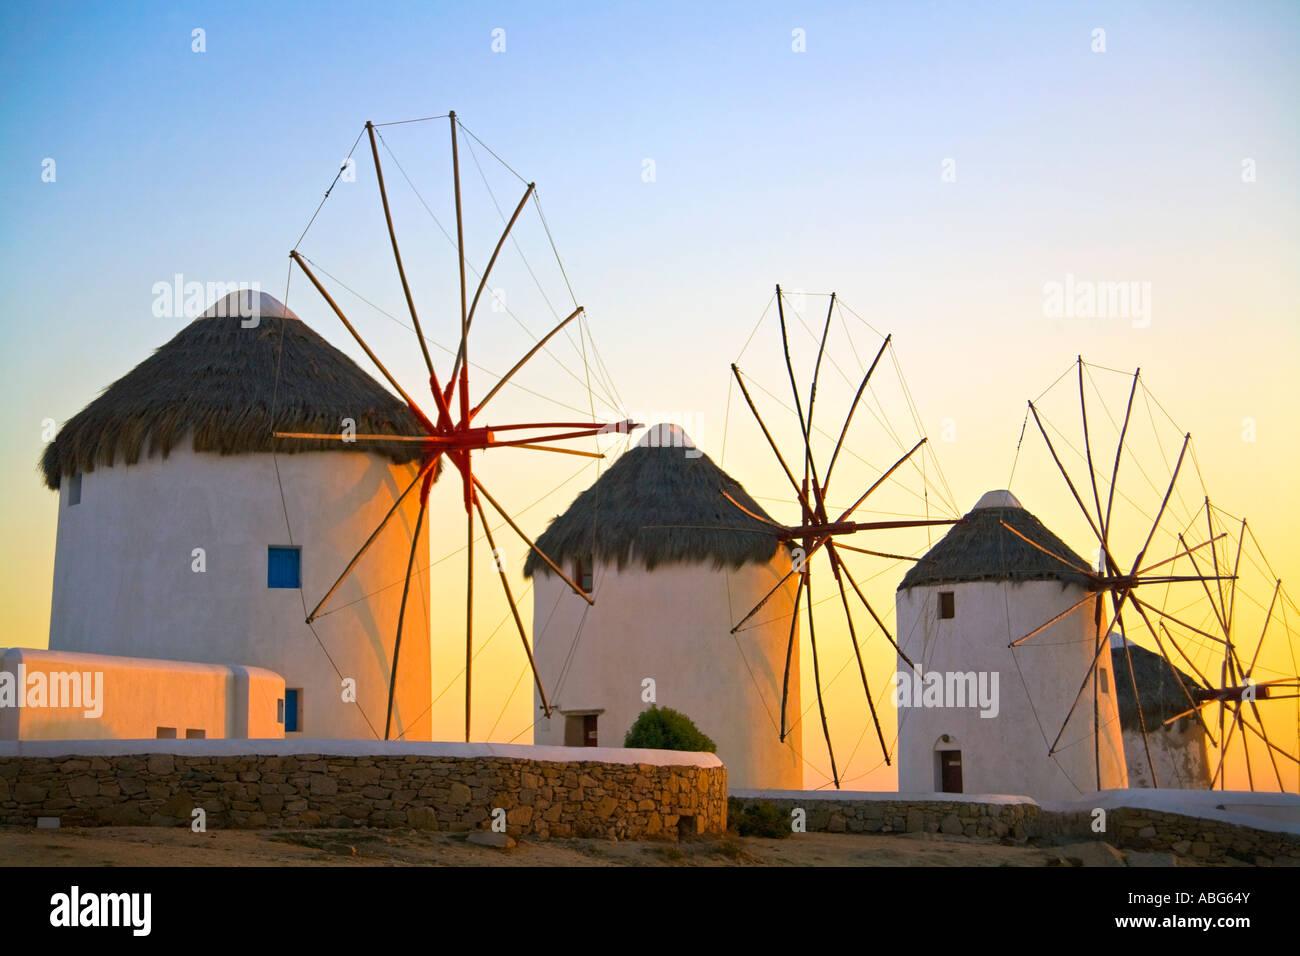 Mykonos, die legendären Windmühlen Ägäis Griechenland Europa Stockbild